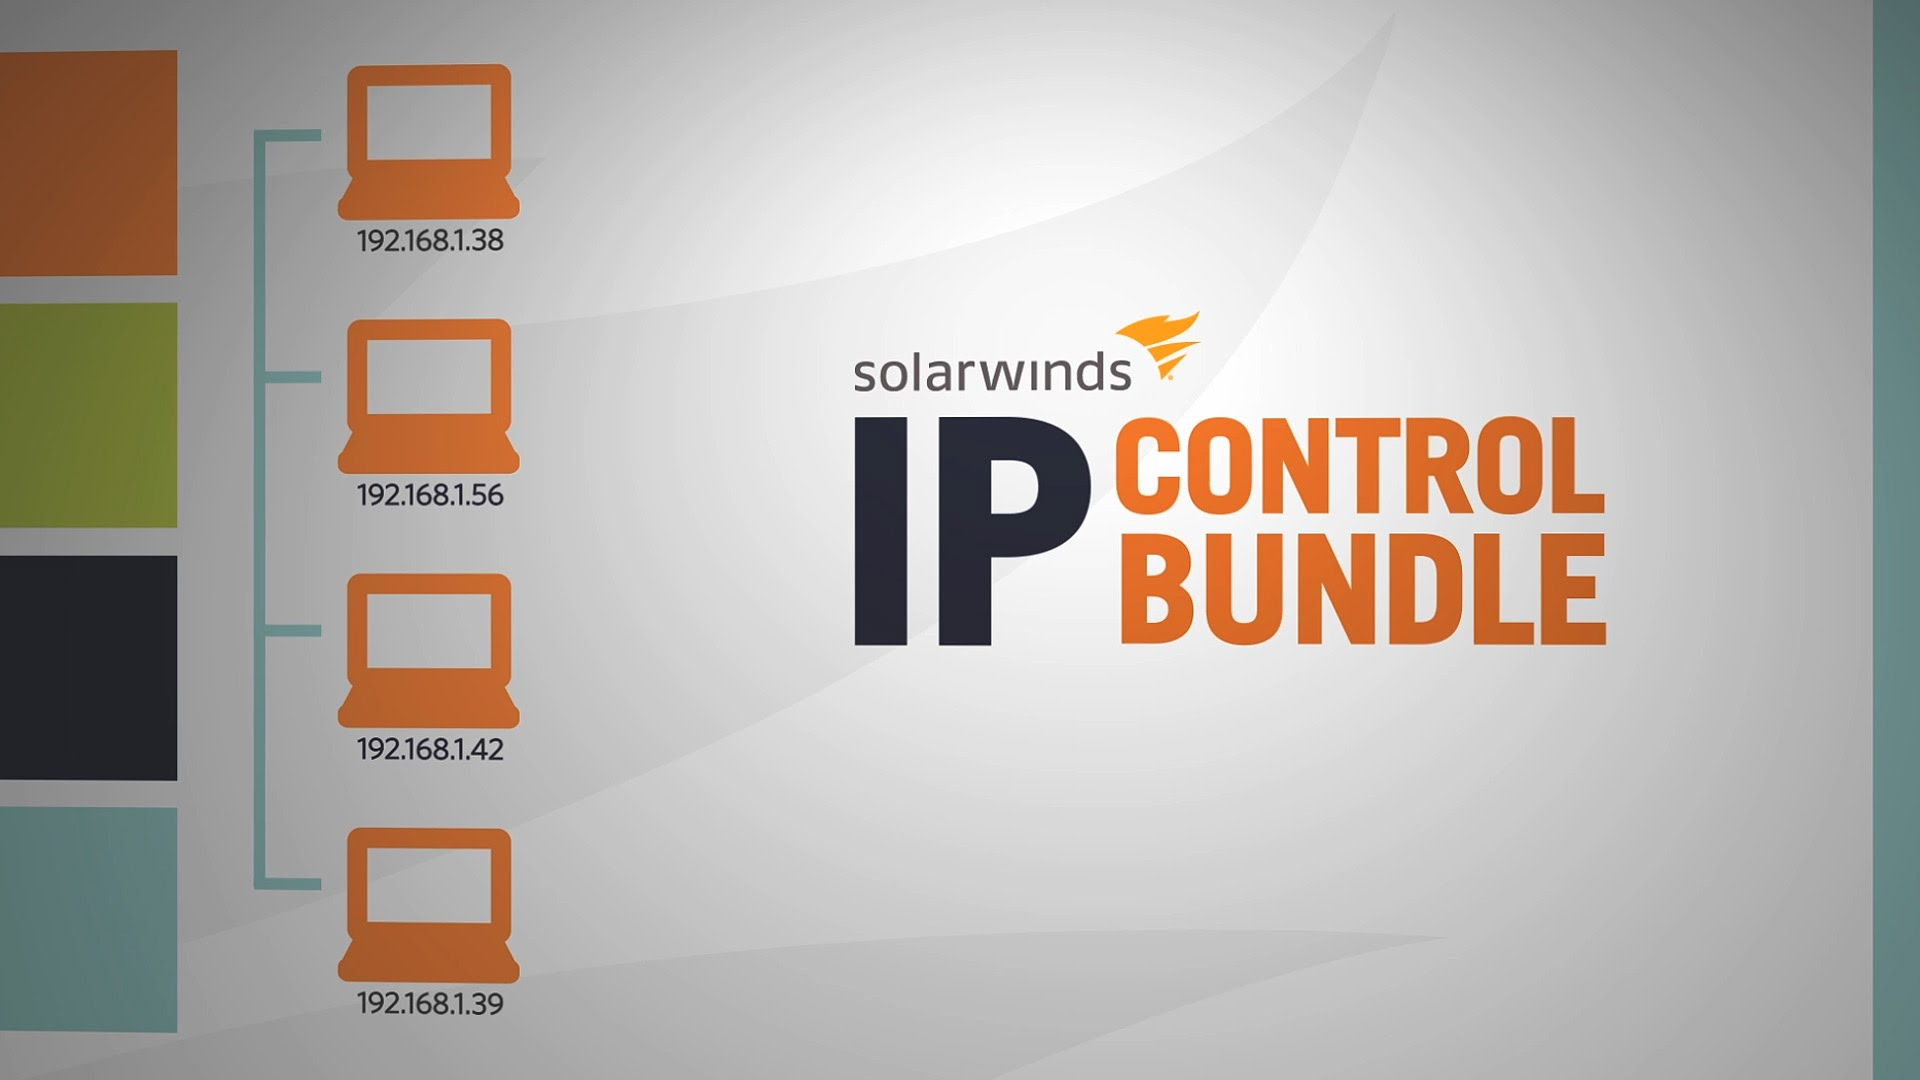 SolarWinds IP Control Bundle Download Free Full Version